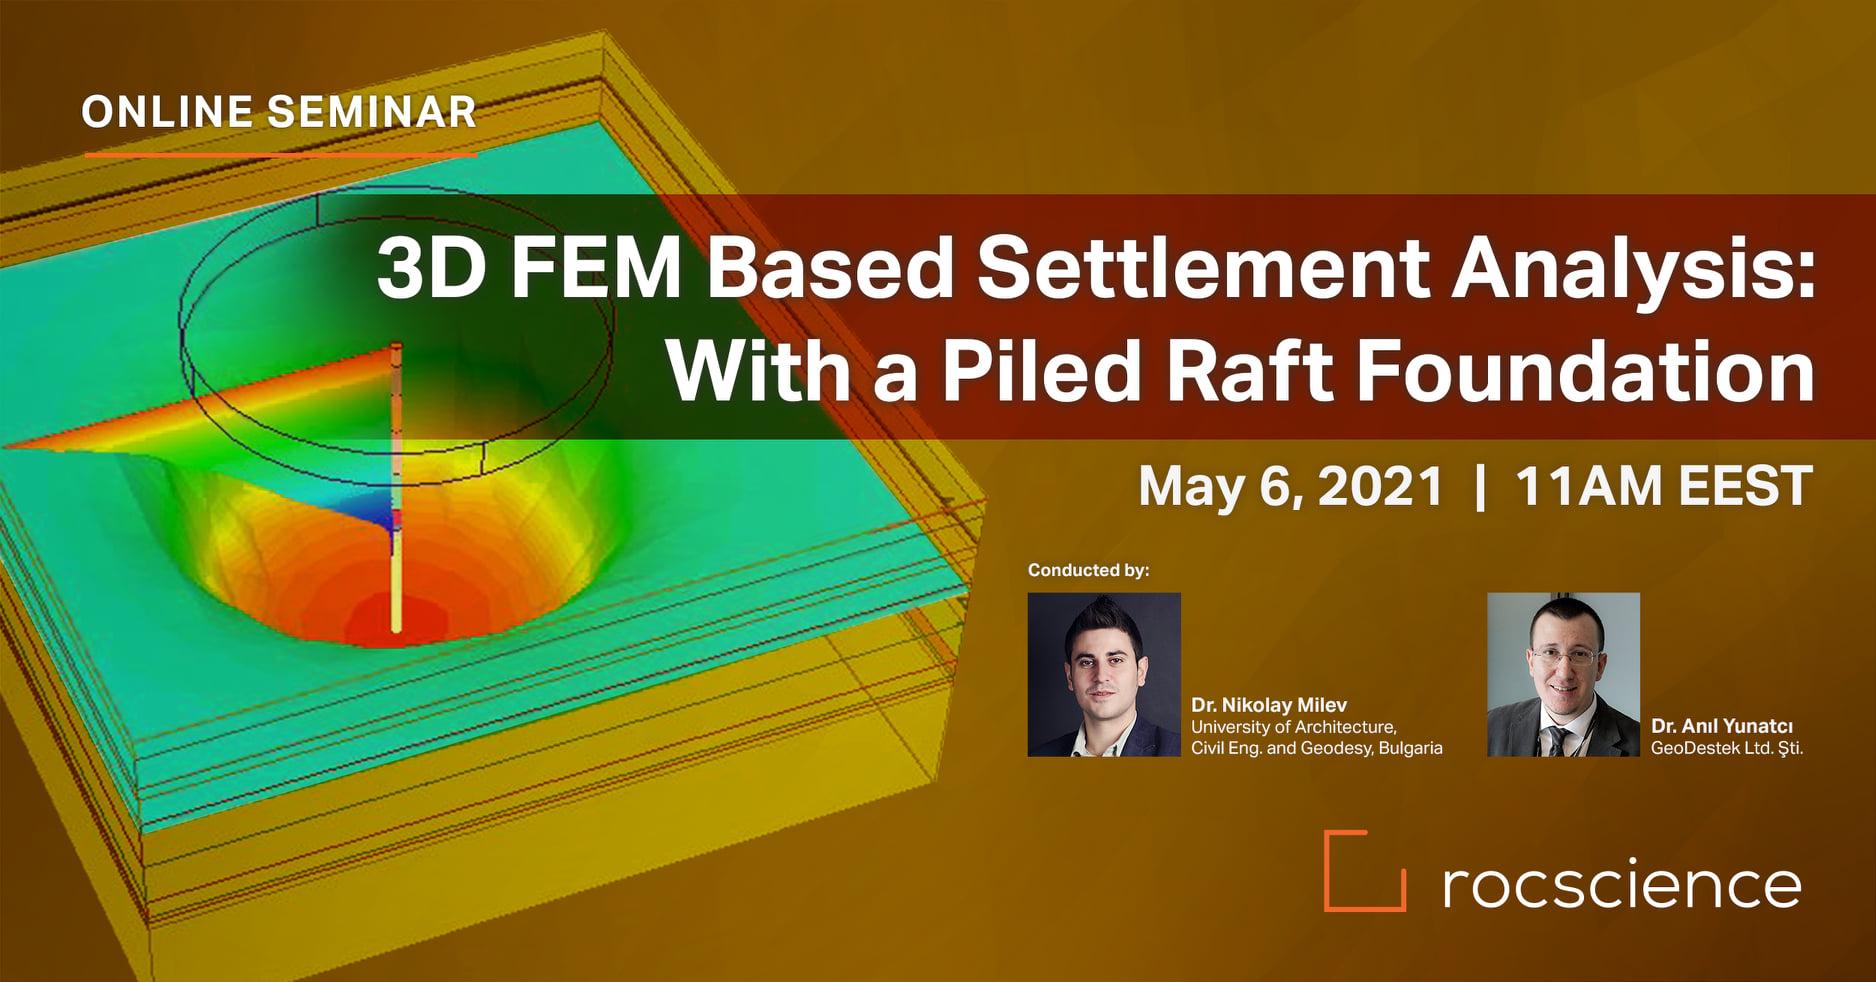 Rocscience Online Seminar - 3D FEM Based Settlement Analysis: Piled Raft Foundation (May 6th, 2021)